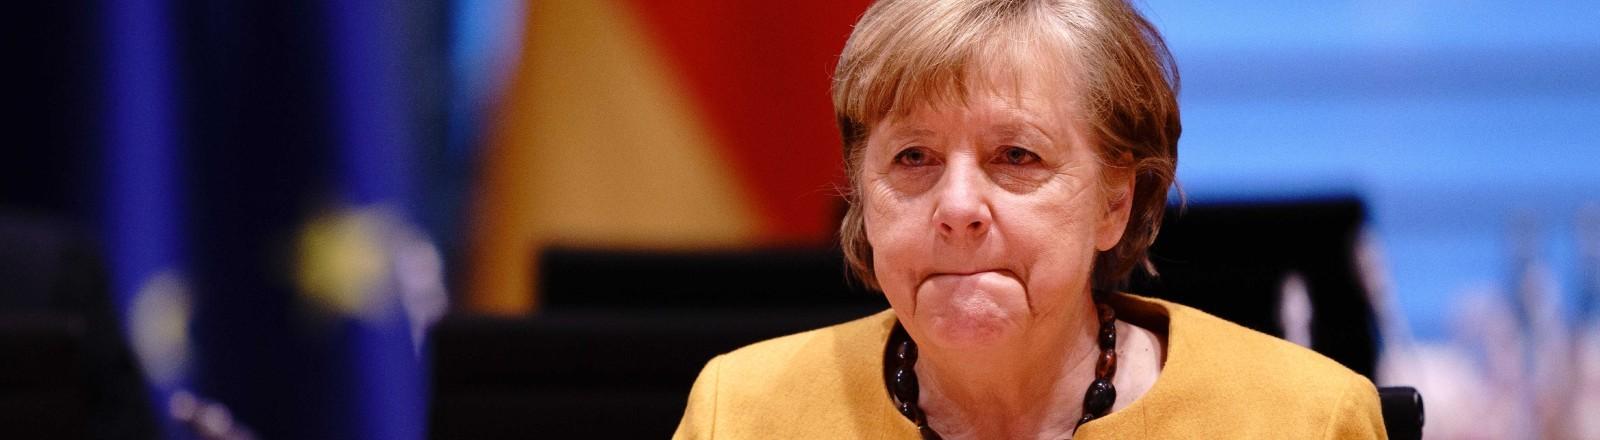 Angela Merkel bei der Ministerpräsidentenkonferenz